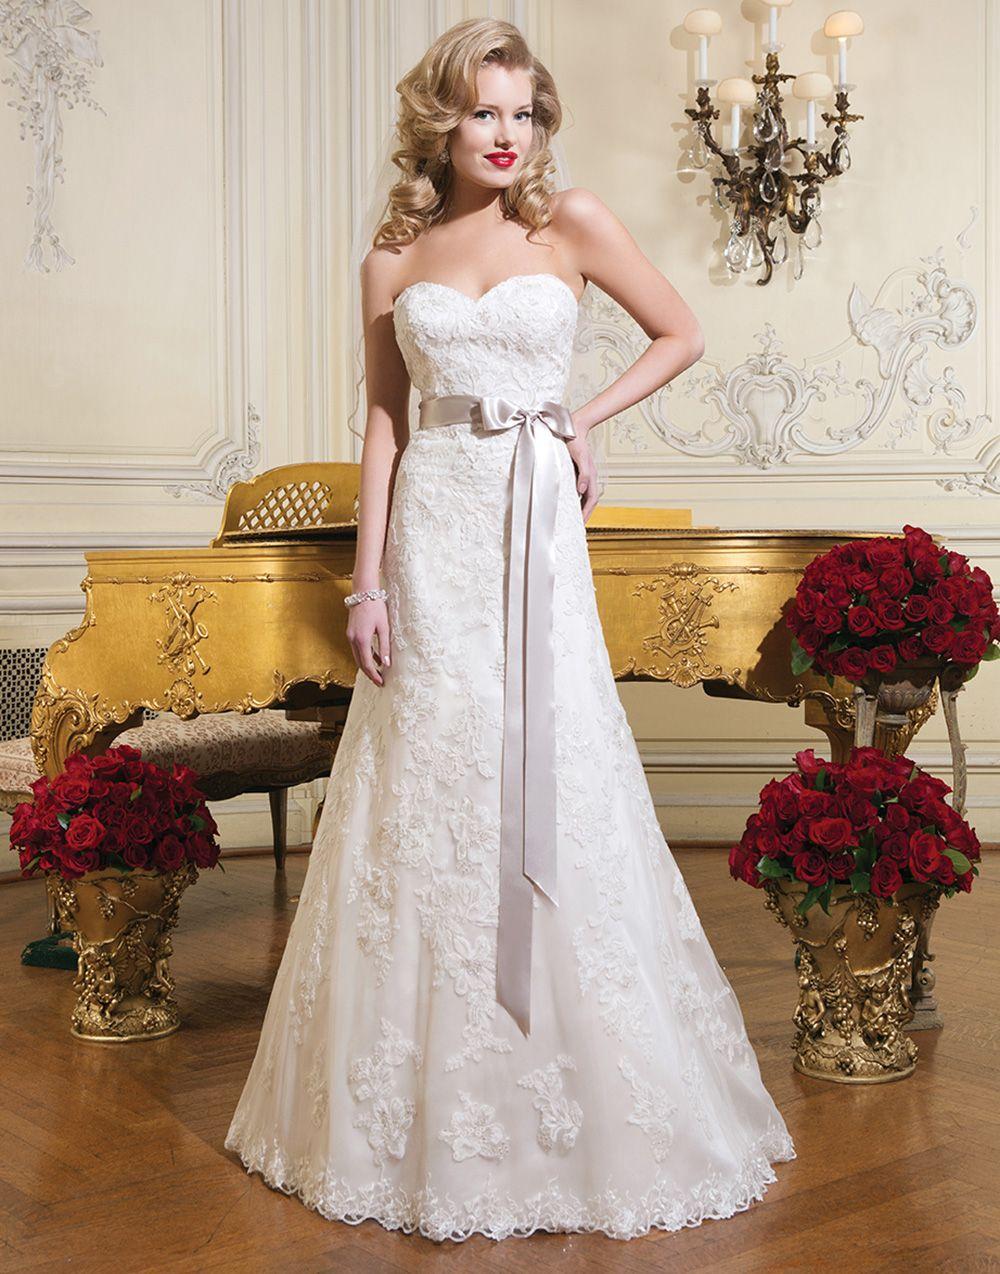 Justin Alexander wedding dresses style 8752 | Wedding dress ...